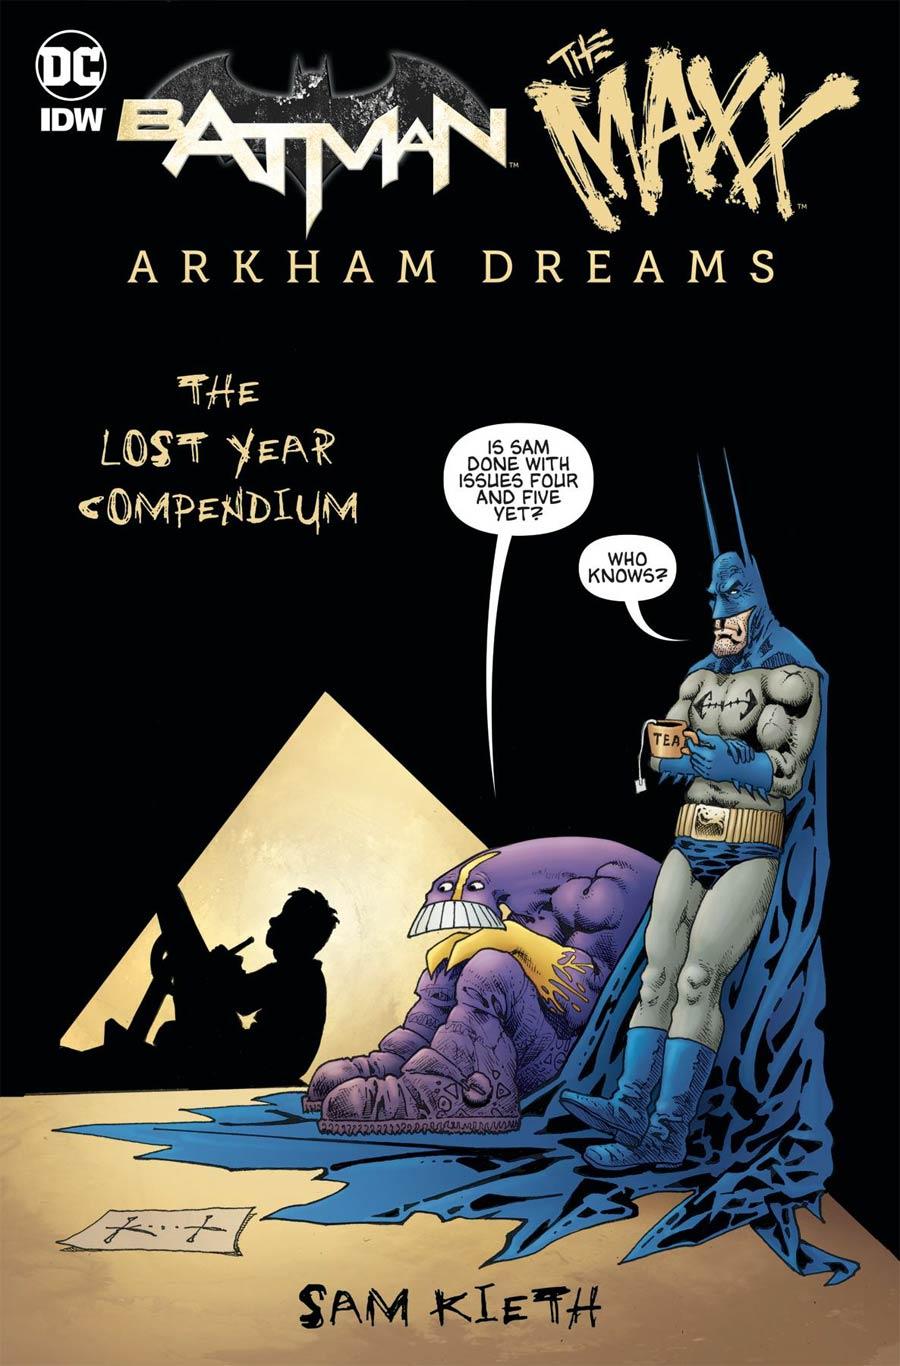 Batman The MAXX Arkham Dreams Lost Year Compendium